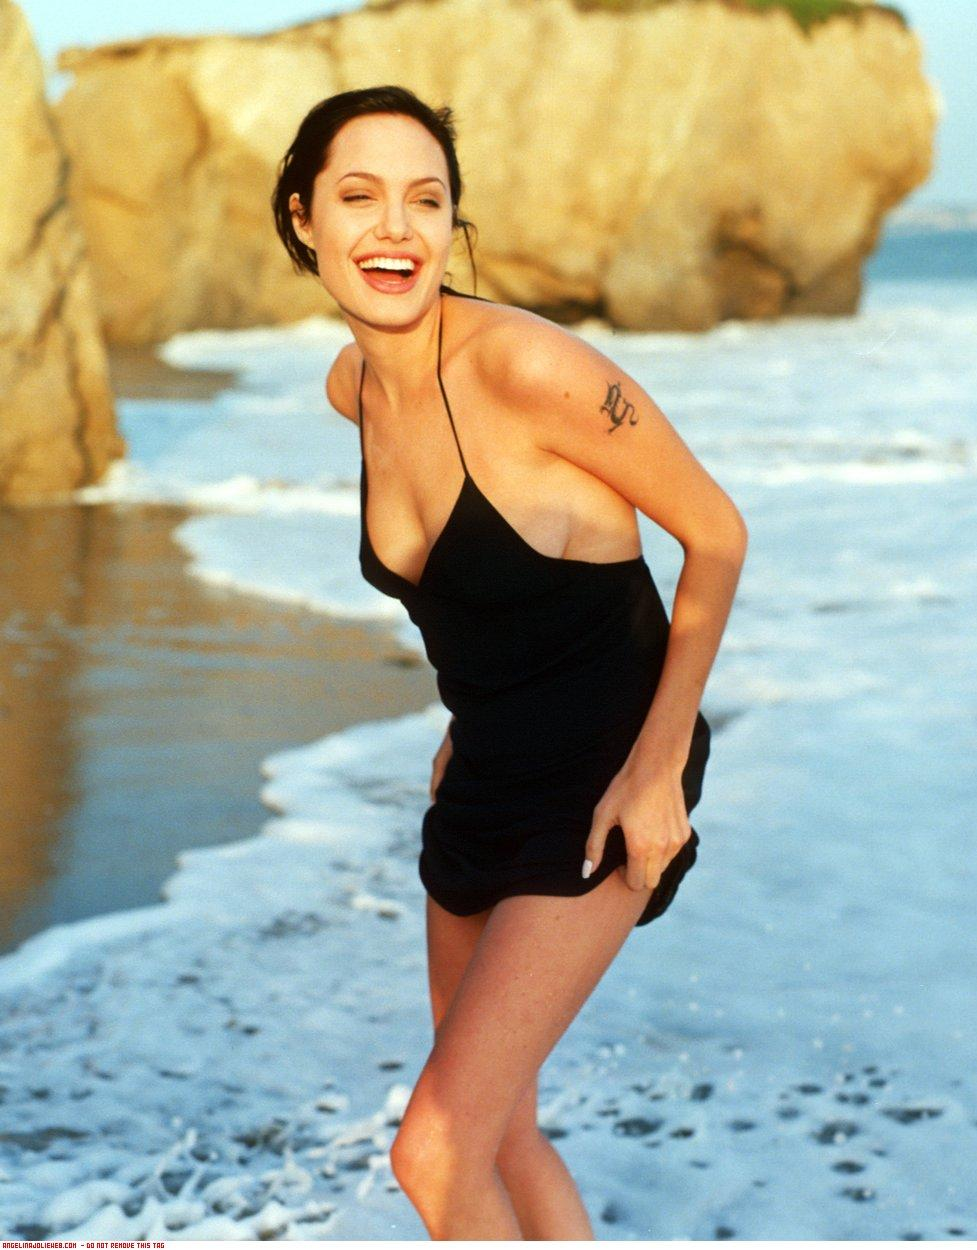 Angelina Jolie Hot Bikini Pictures, Free Porn a3: xHamster de